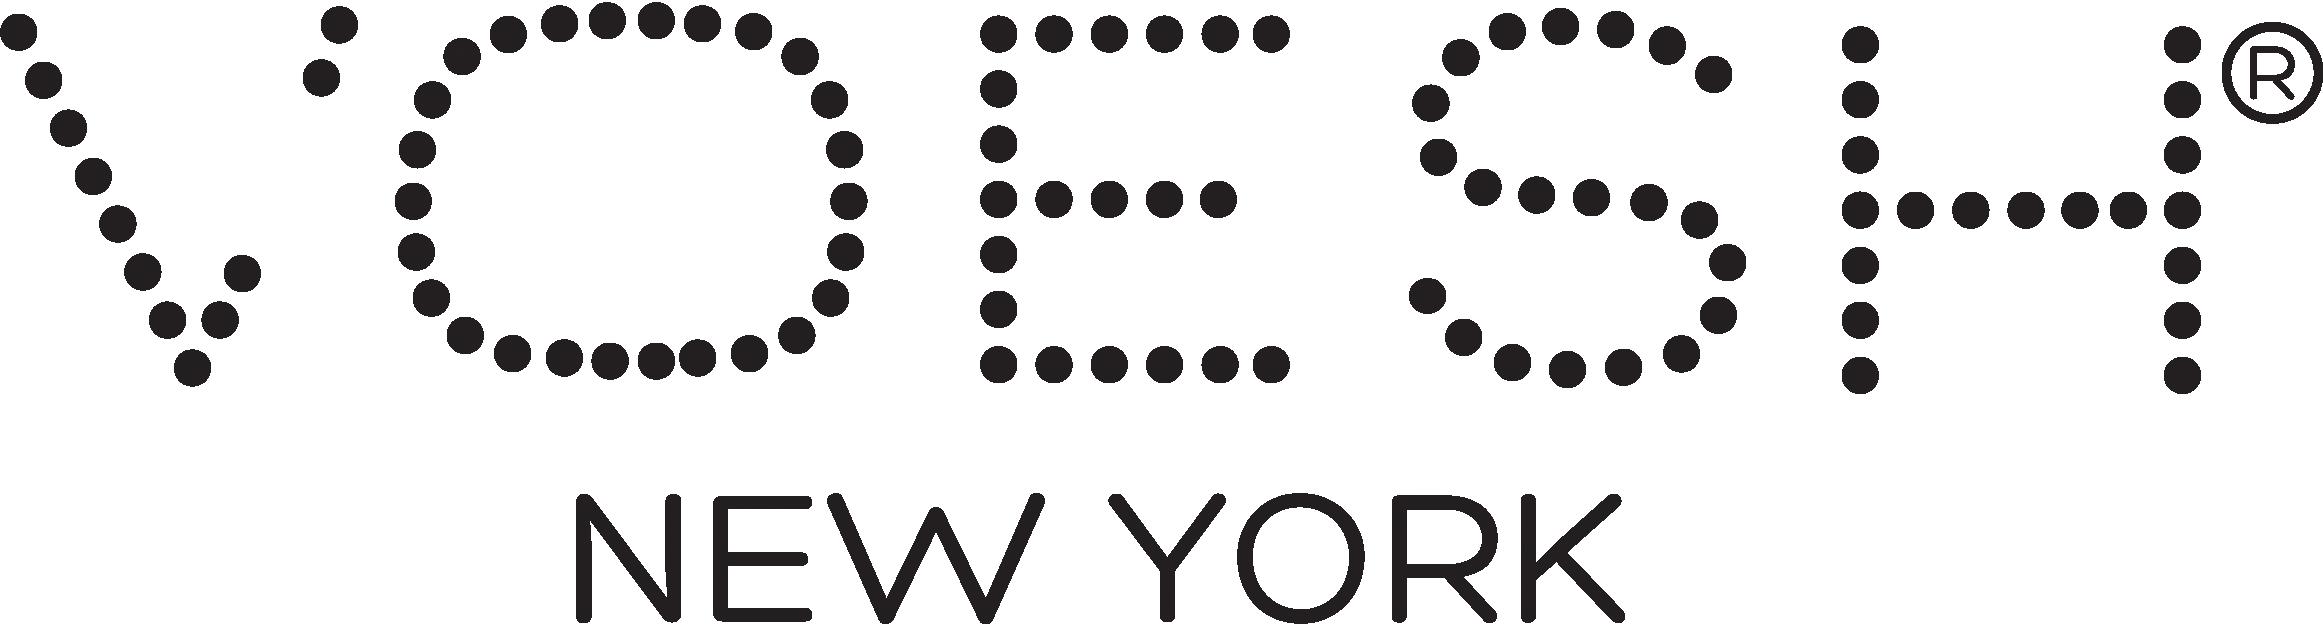 logo_0fd3497c-ada5-4463-8b5a-9ac604e23f4d.png